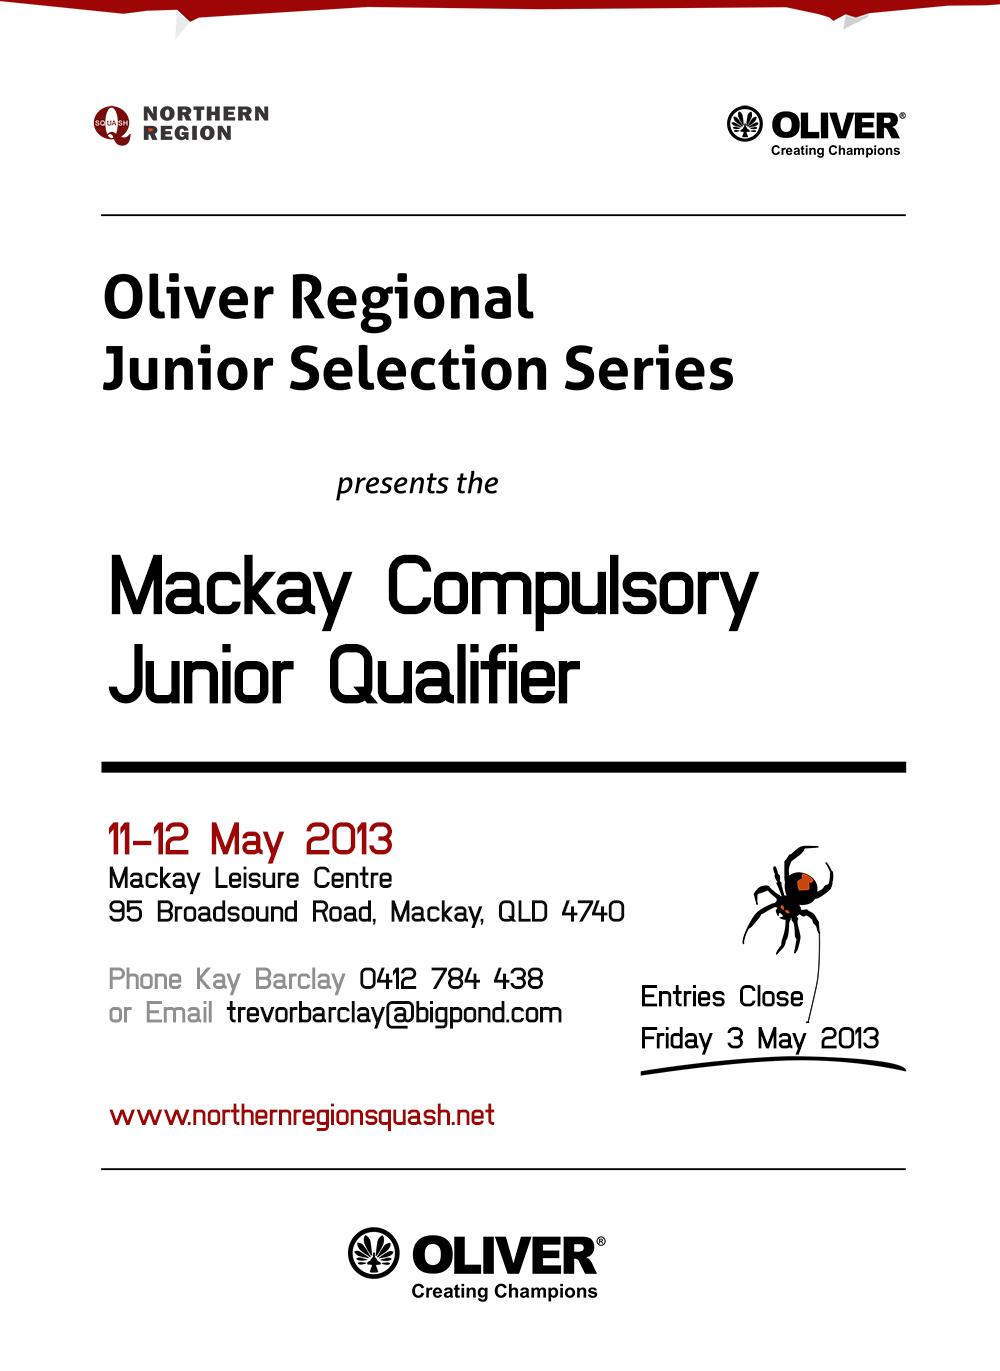 2013 Mackay compulsory poster